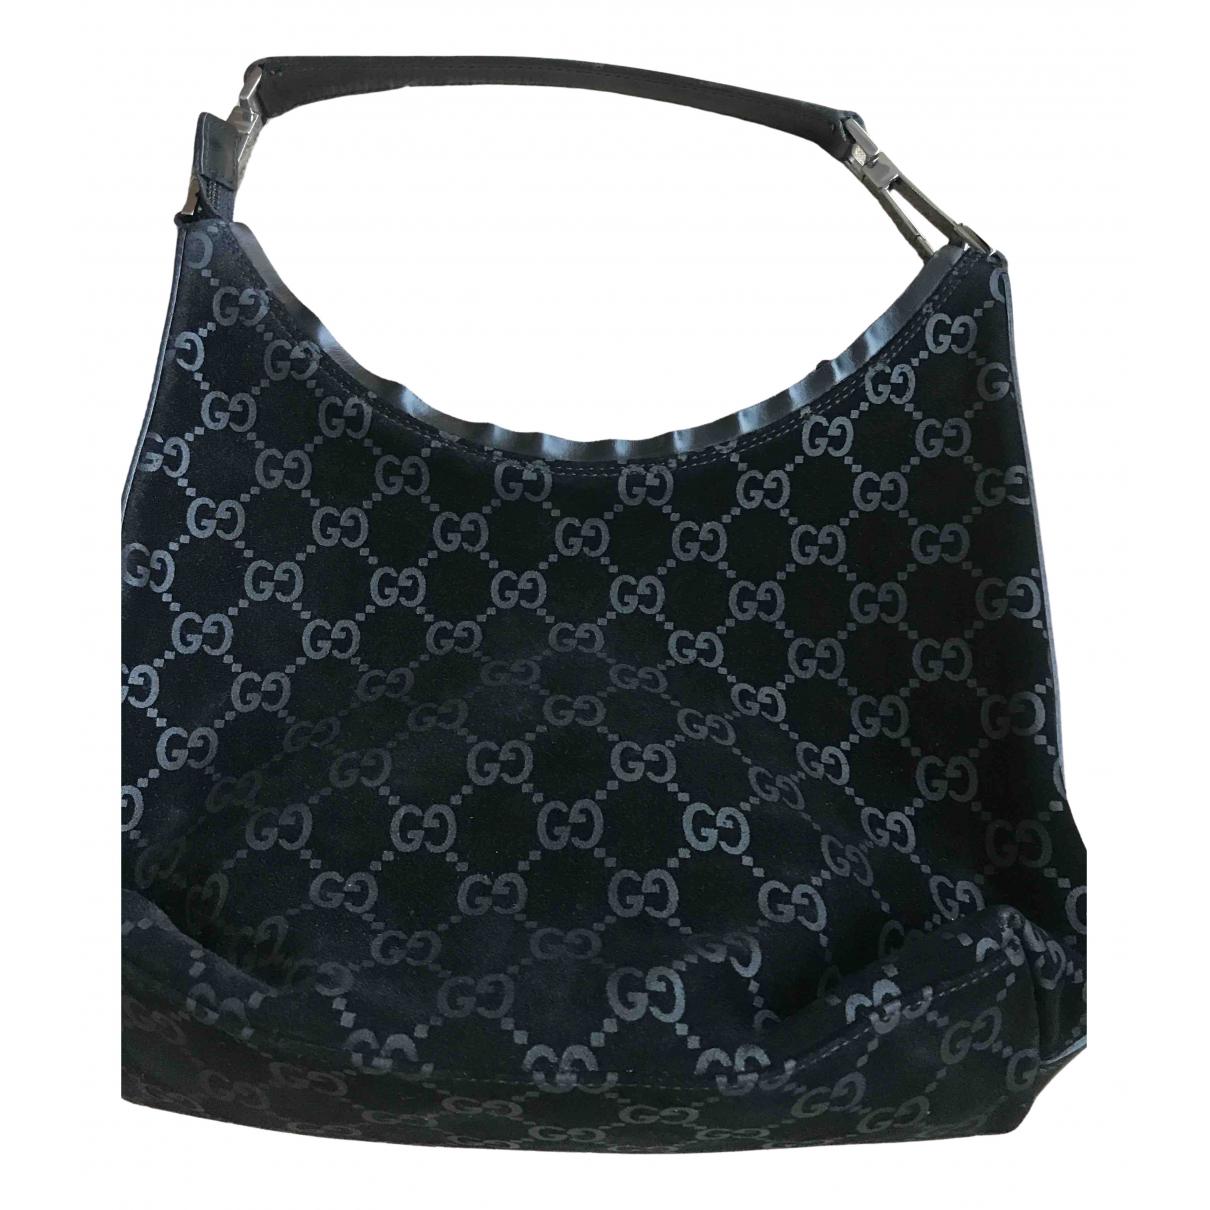 Gucci \N Black Suede handbag for Women \N